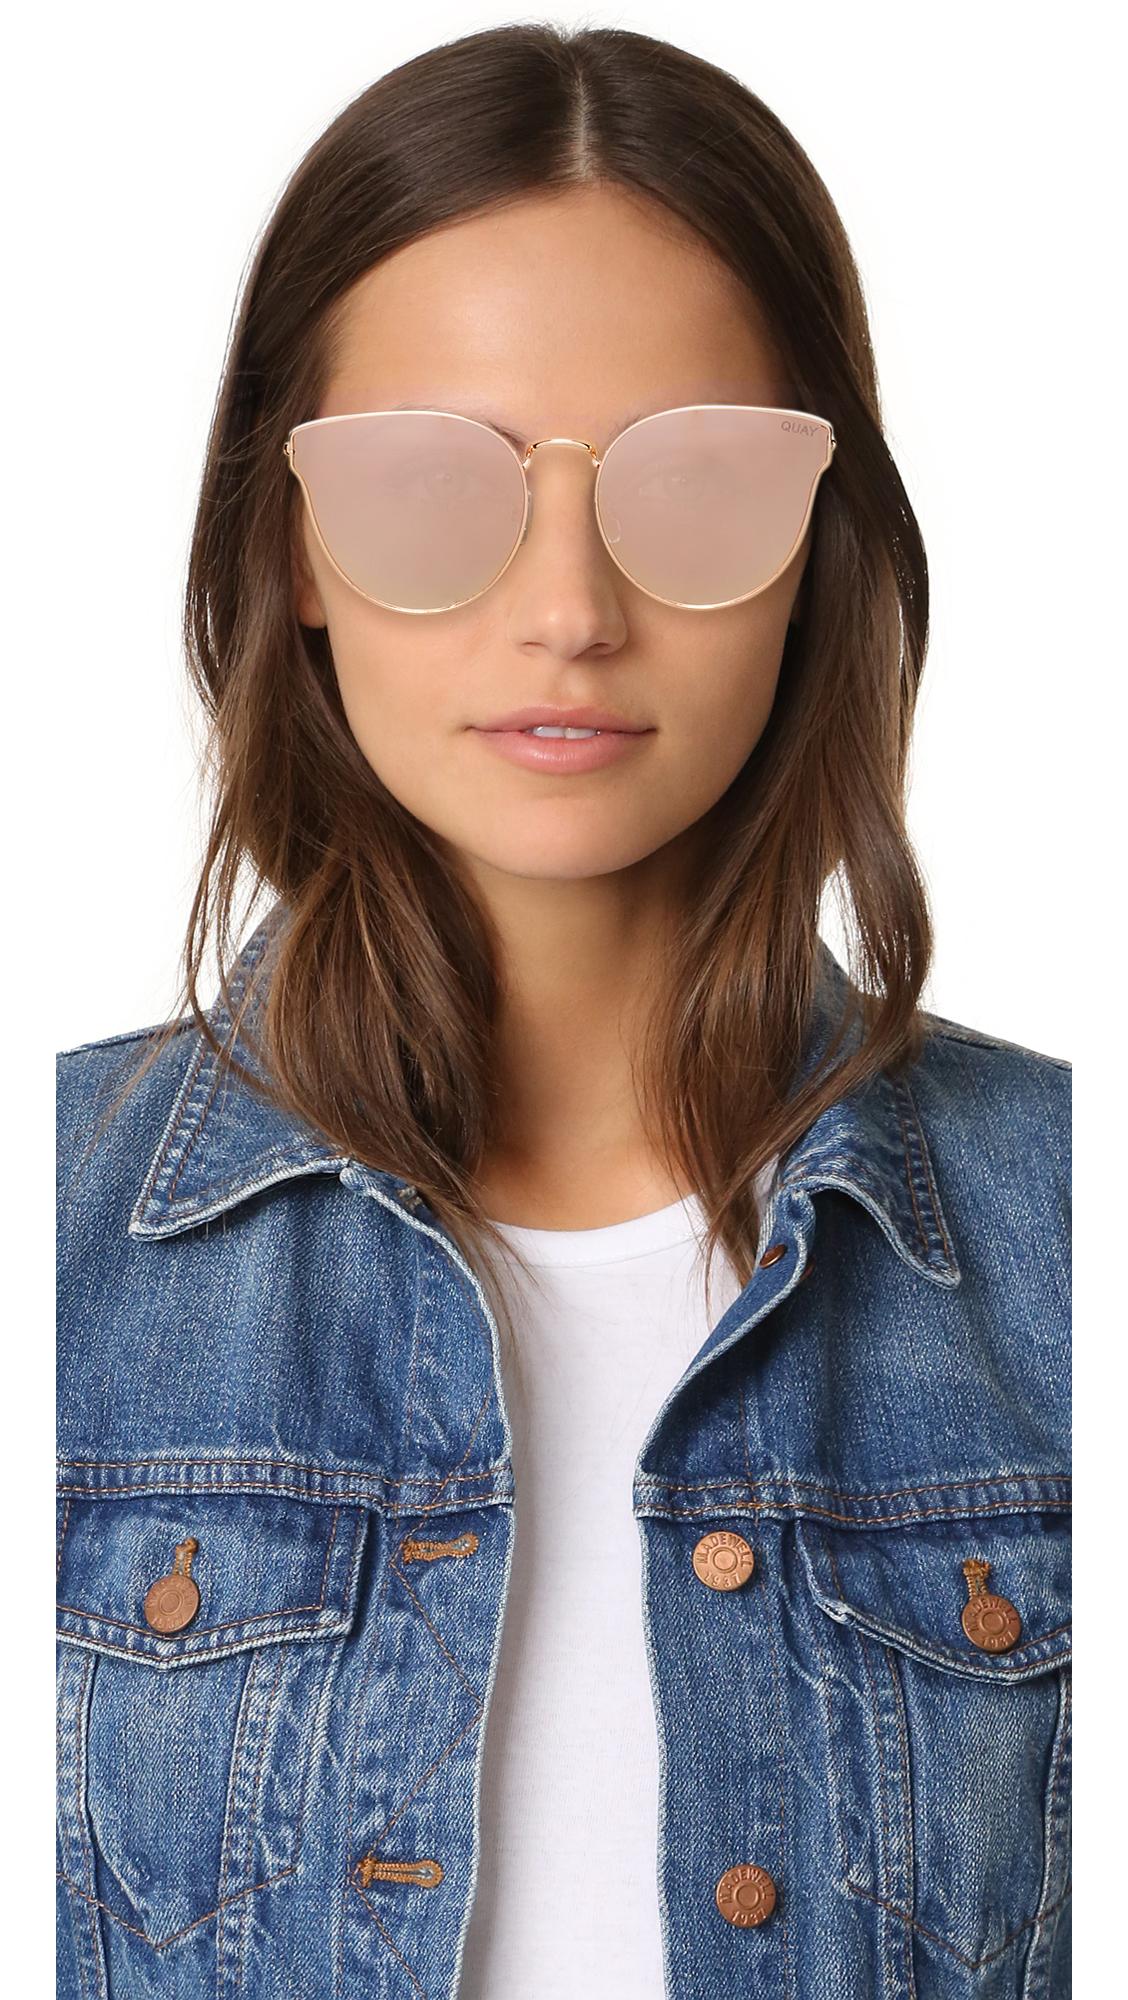 380635cff1bc4 Quay All My Love Sunglasses